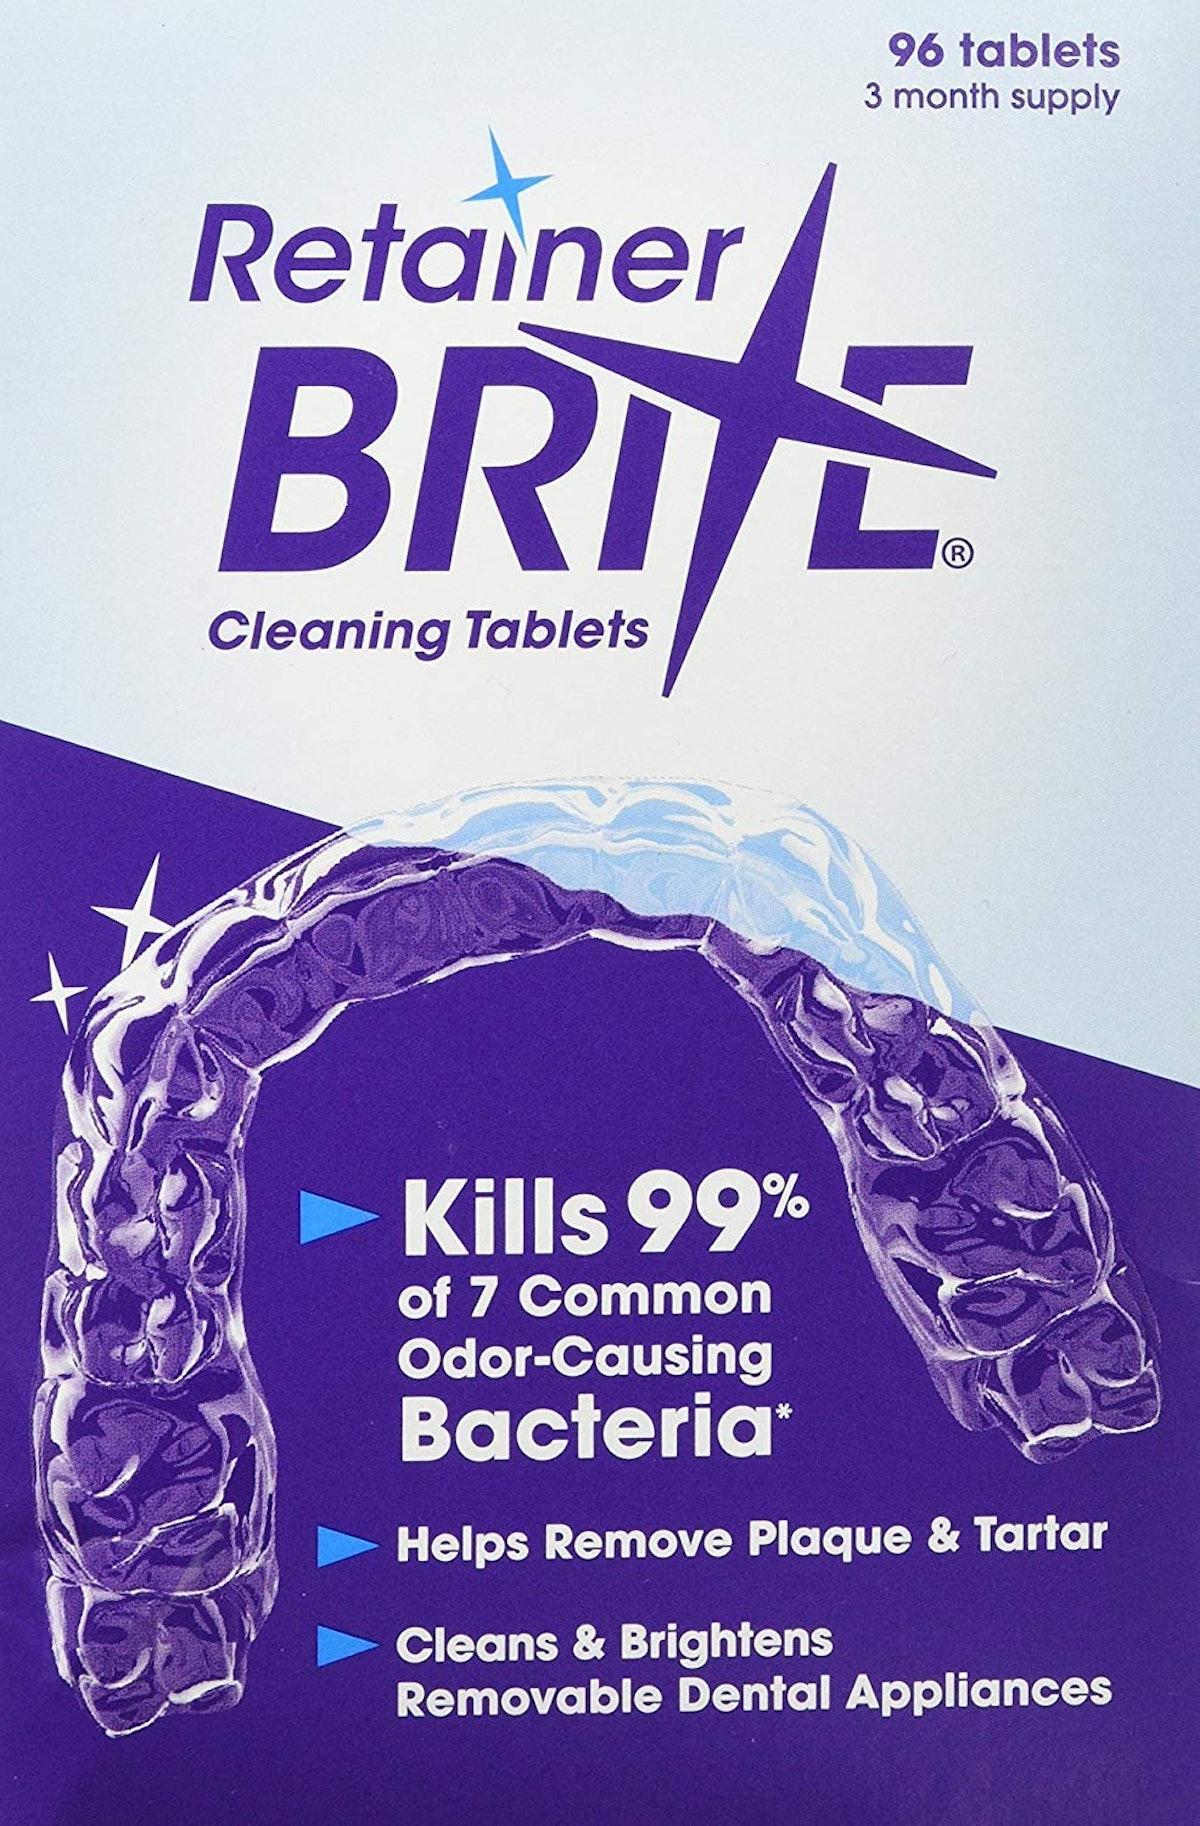 Retainer Brite 96 Tablets